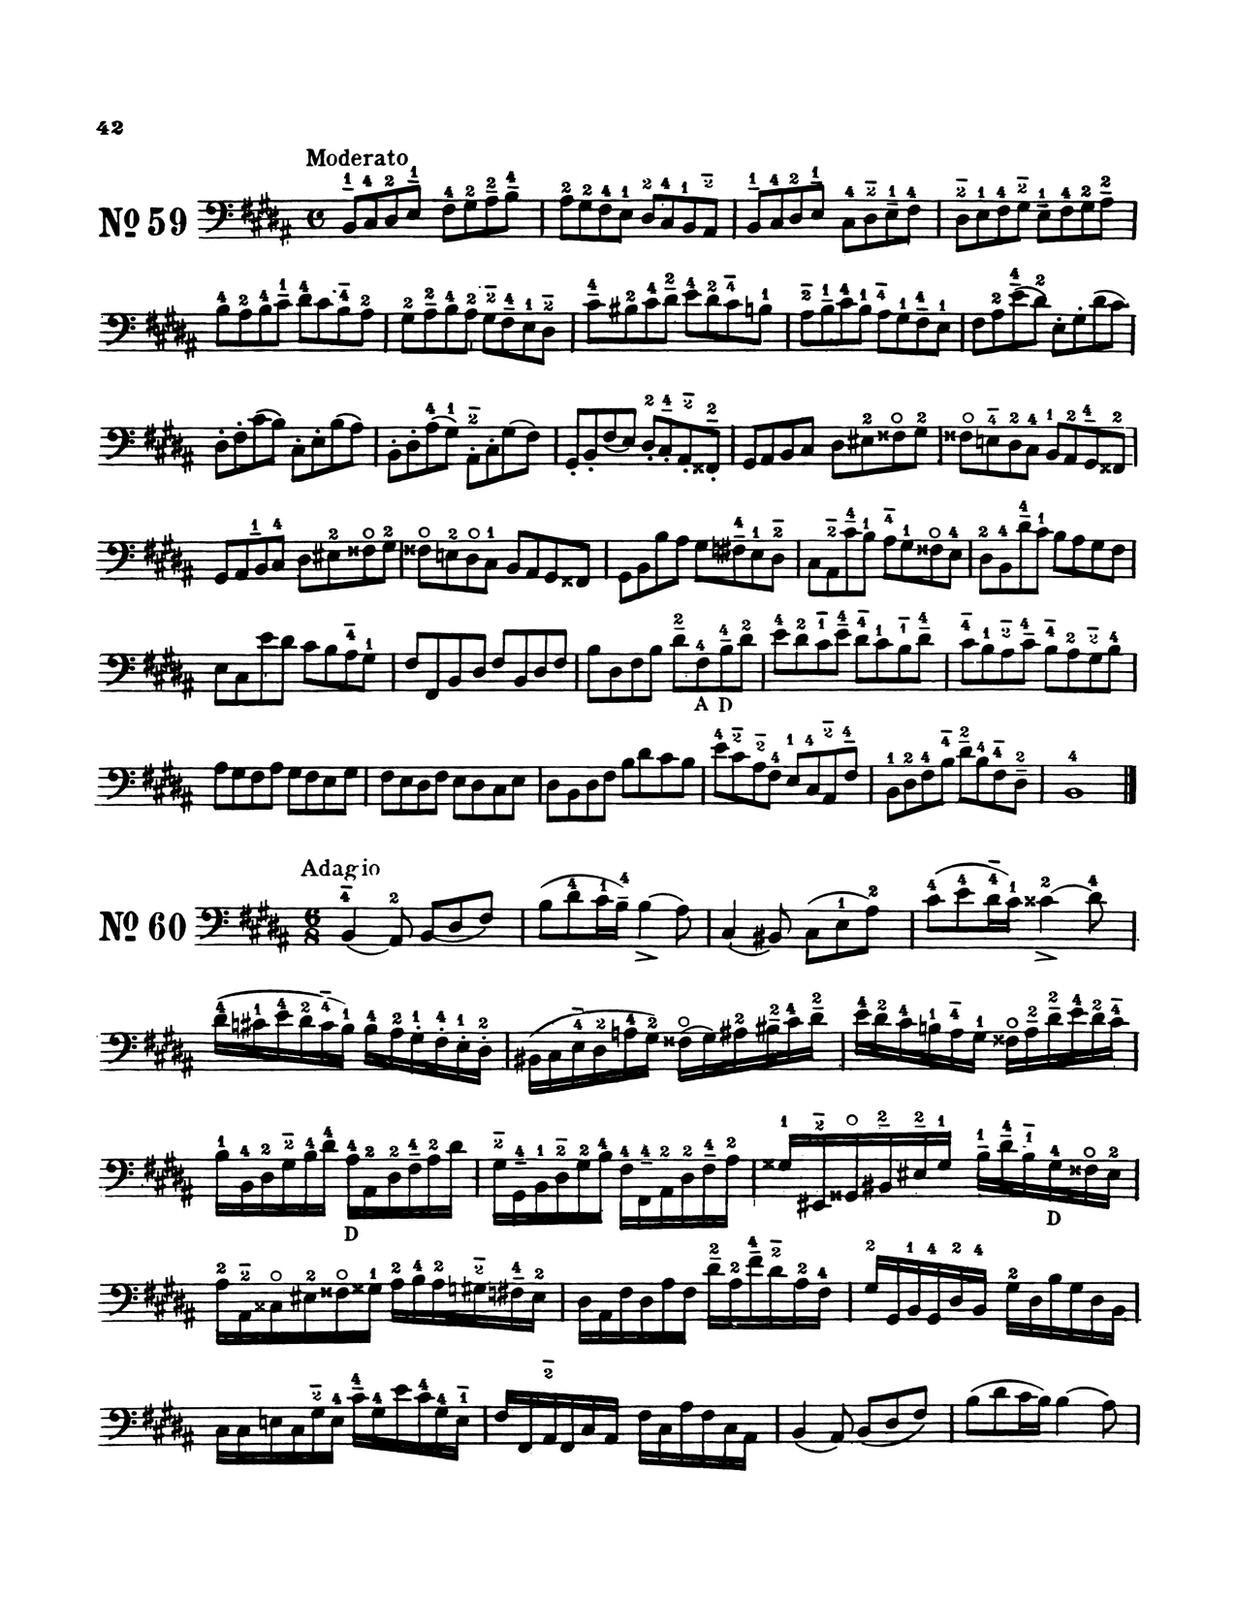 Slama, 66 Etudes in all Major and Minor Keys for Trombone, Tuba, Bassoon String Bass 5